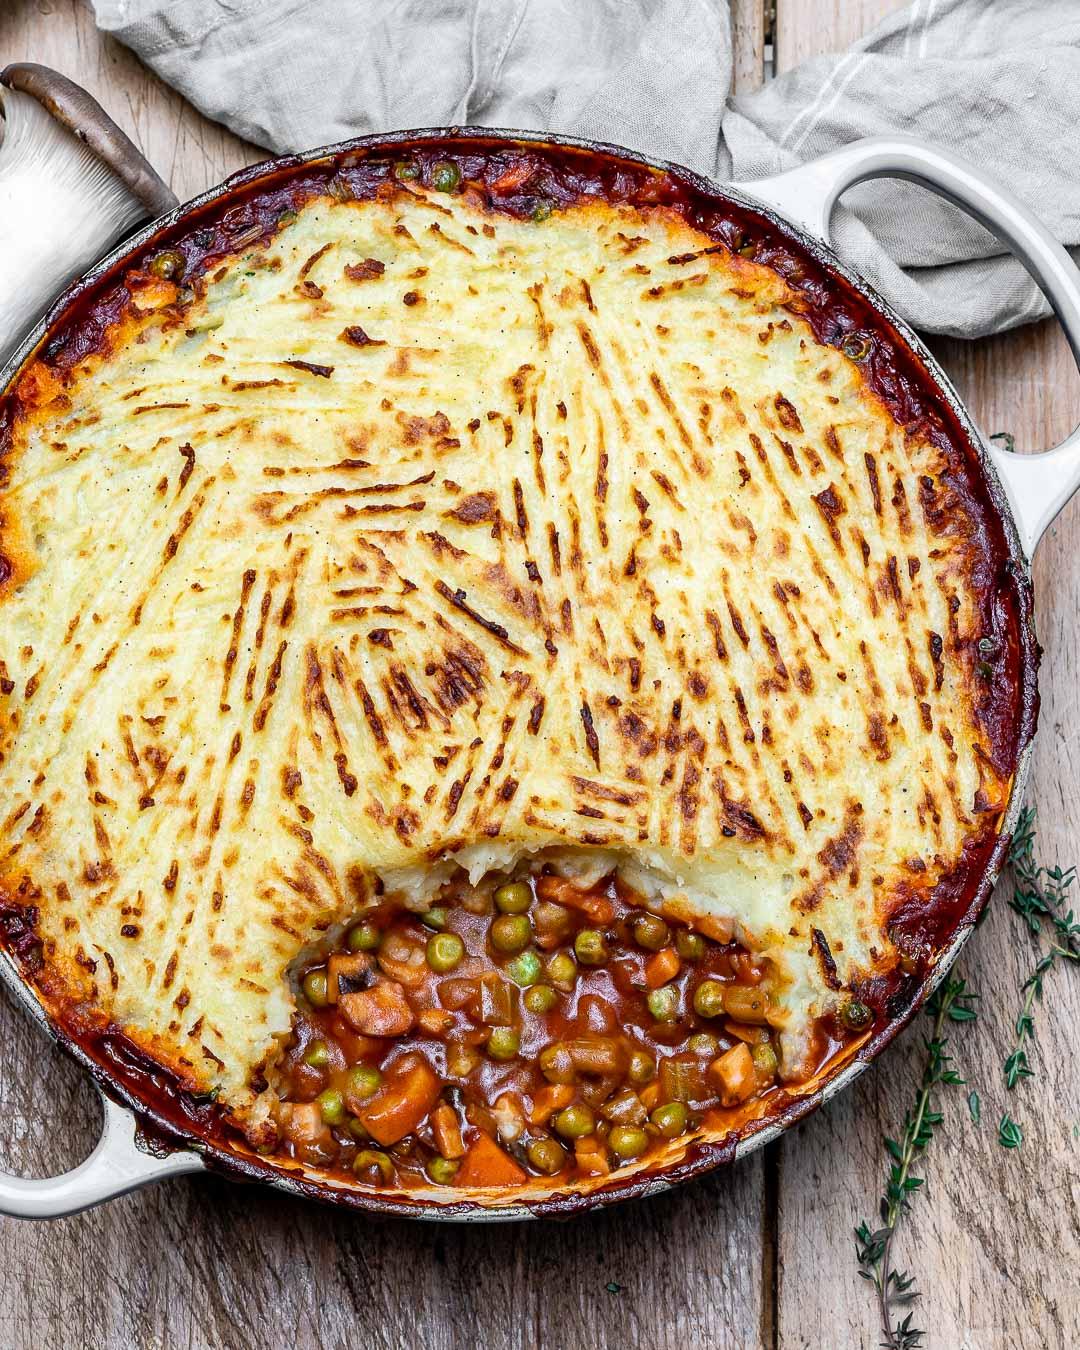 Placinta Ciobanului / Shepherd's Pie (Reteta Vegana) 8